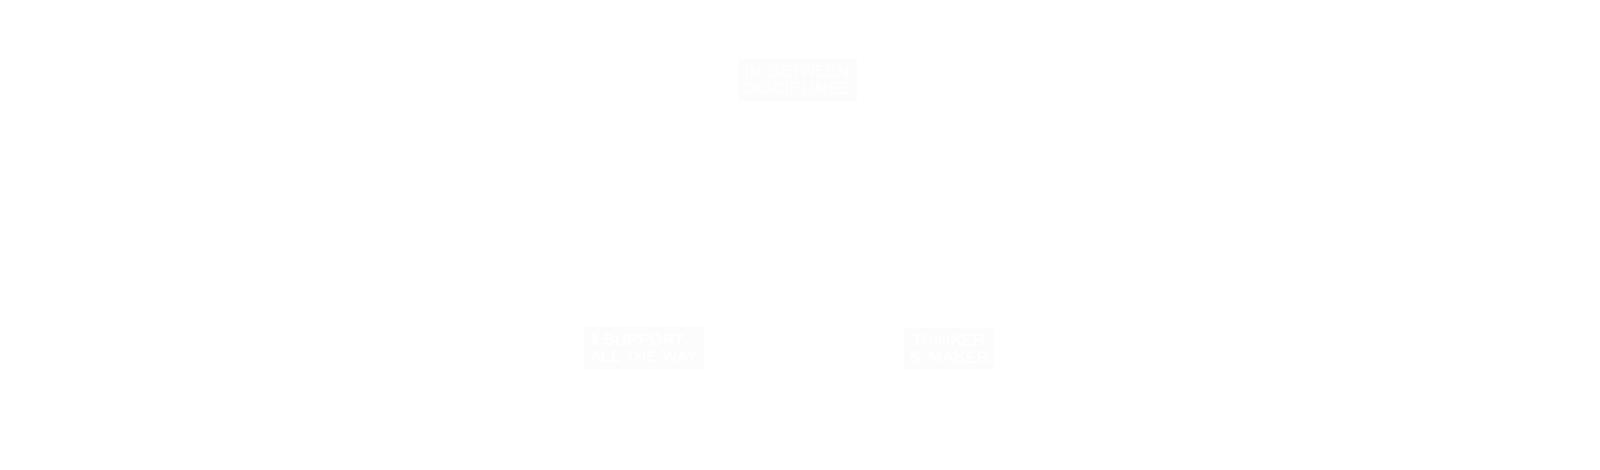 Monitor-electronics